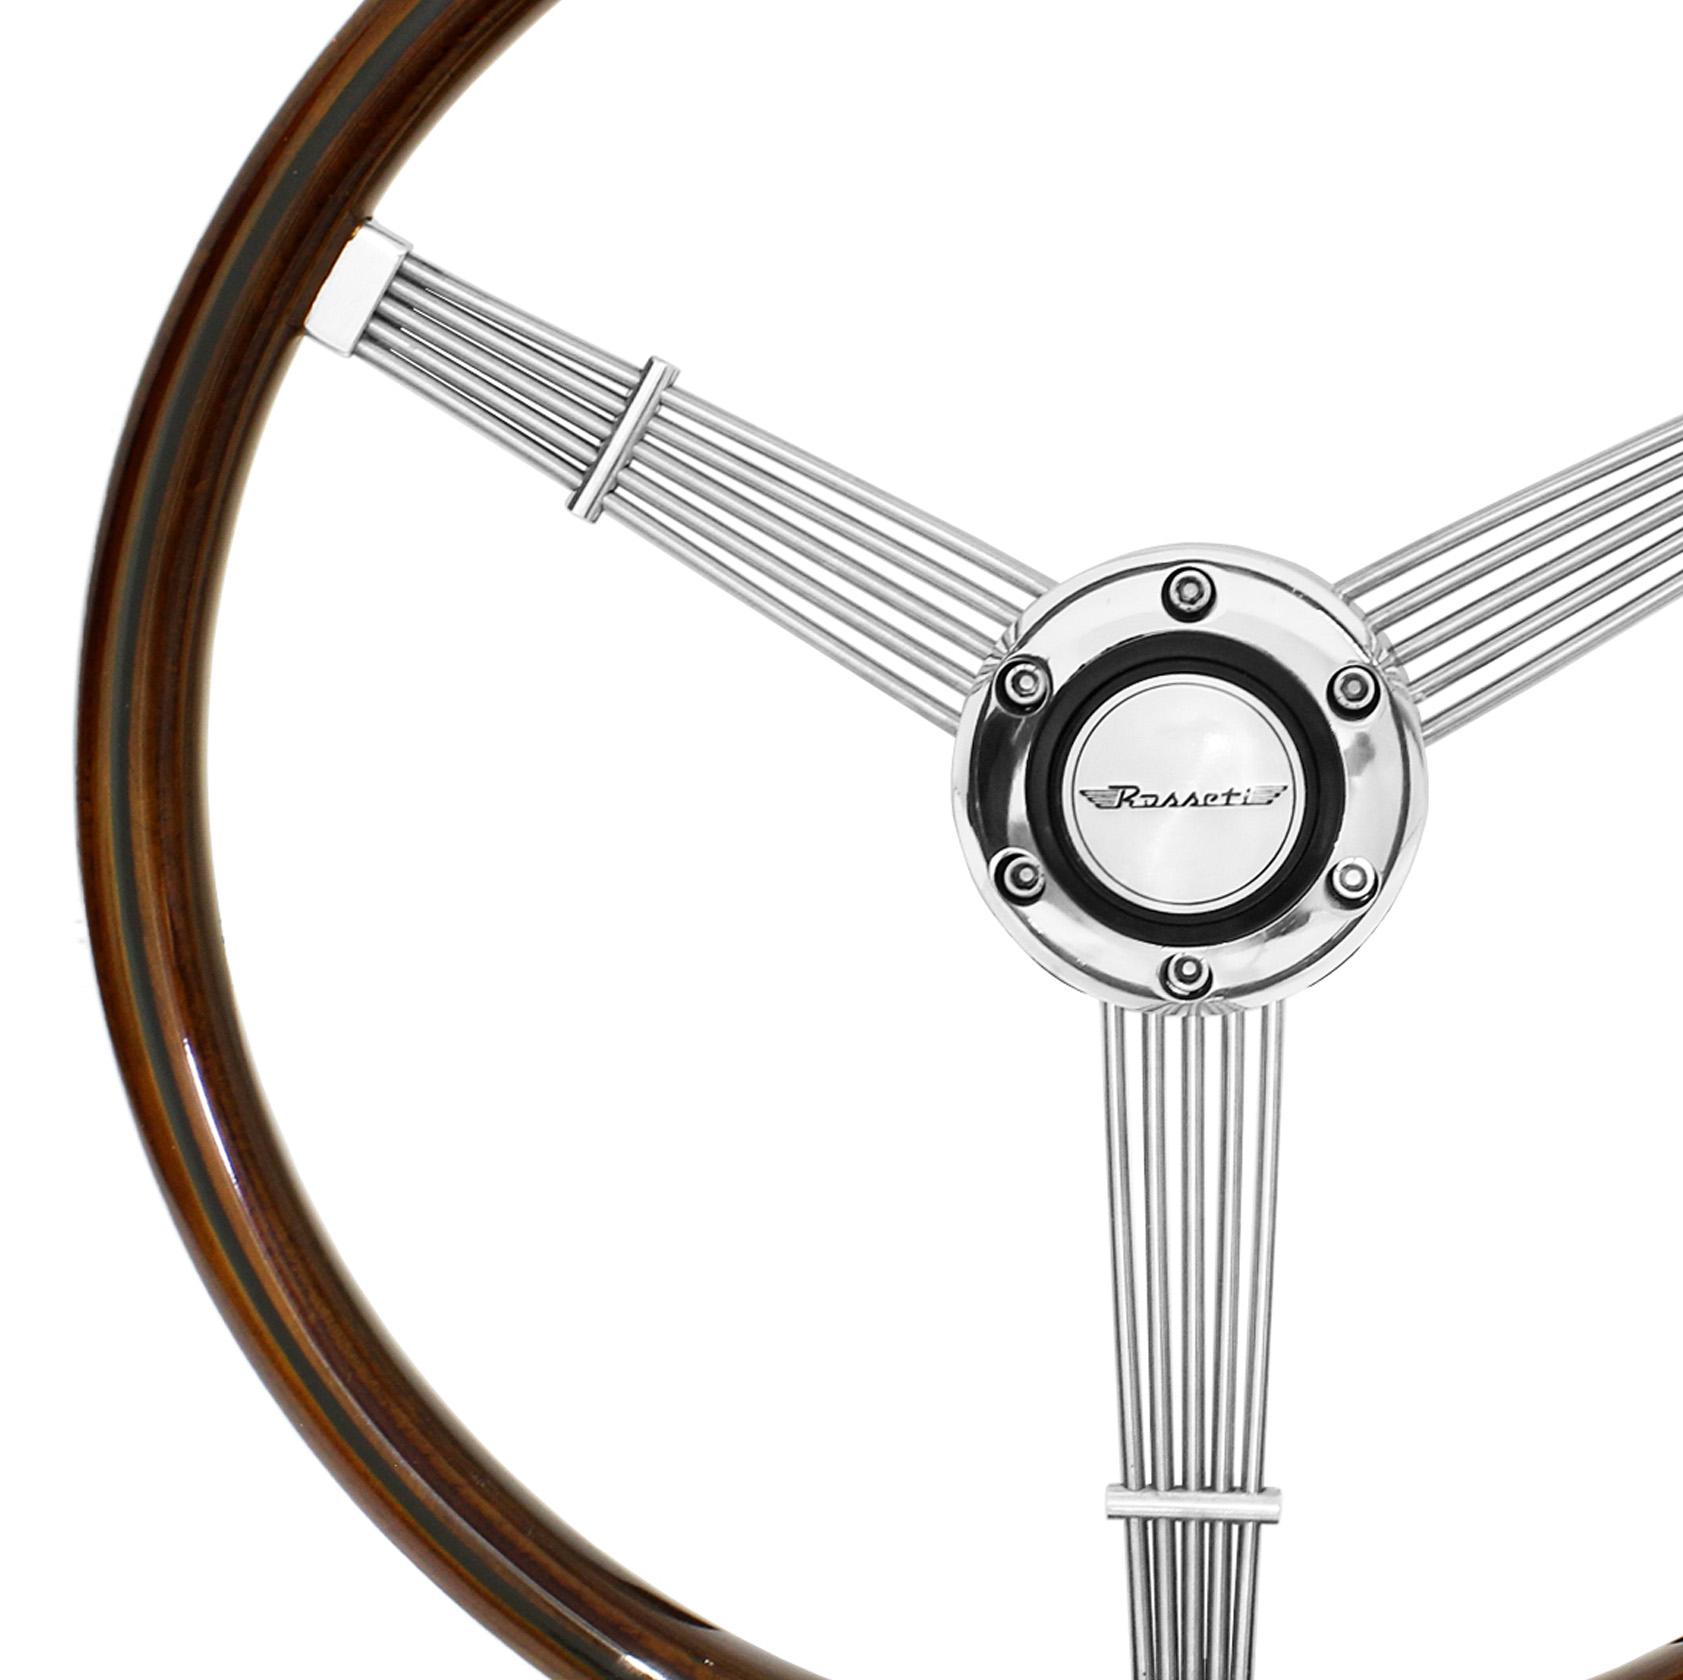 Volante Rosseti Banjo FB 356 Madeira 385mm Reto